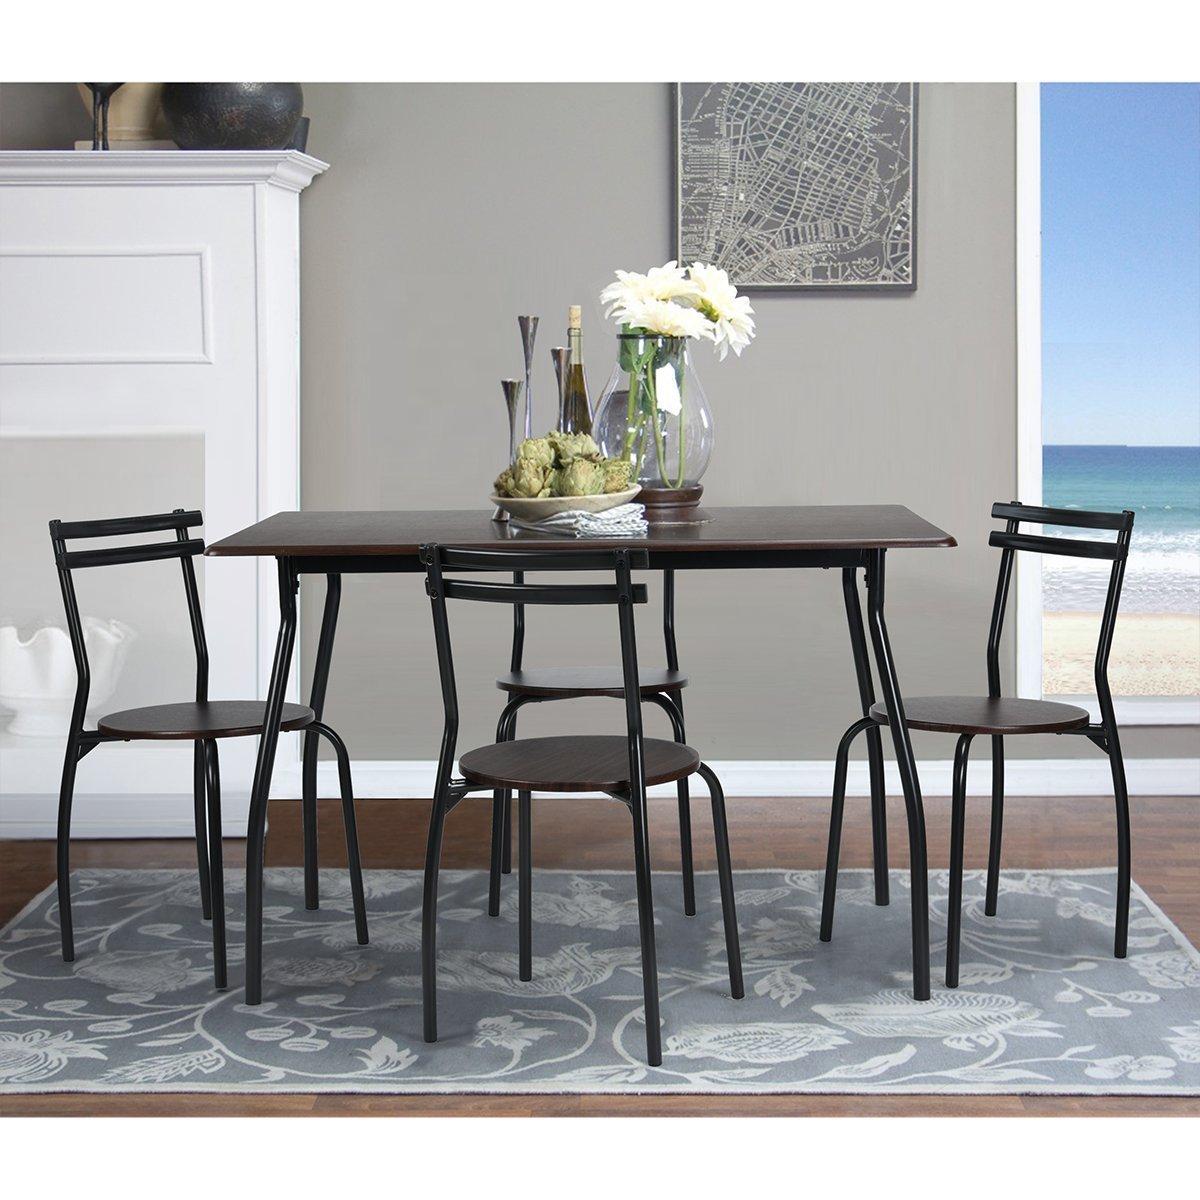 Coavas 5pcs Dining Table Set Kitchen Furniture Kitchen Table Rectangle Dining Table with 4 Round Dining Chair Dinning Set